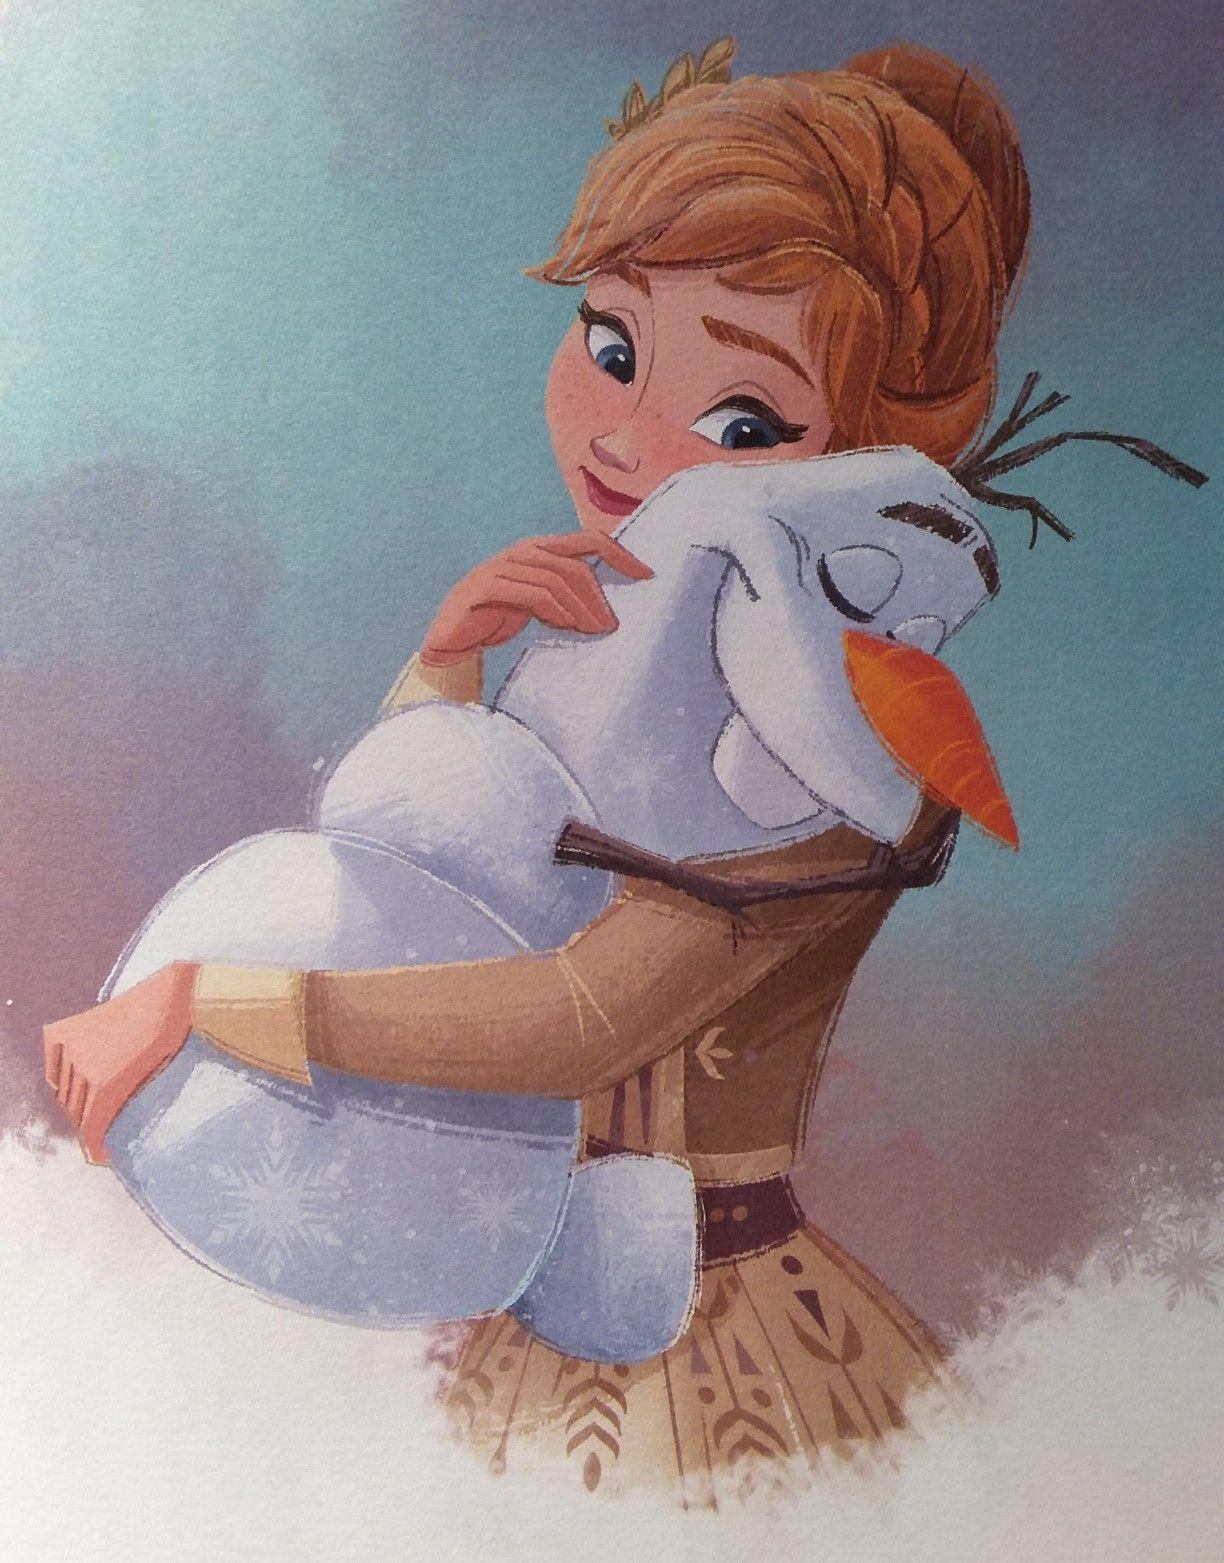 Frozen 2 Anna And Olaf Hugging Disney Princess Drawings Frozen Disney Movie Disney Princess Pictures